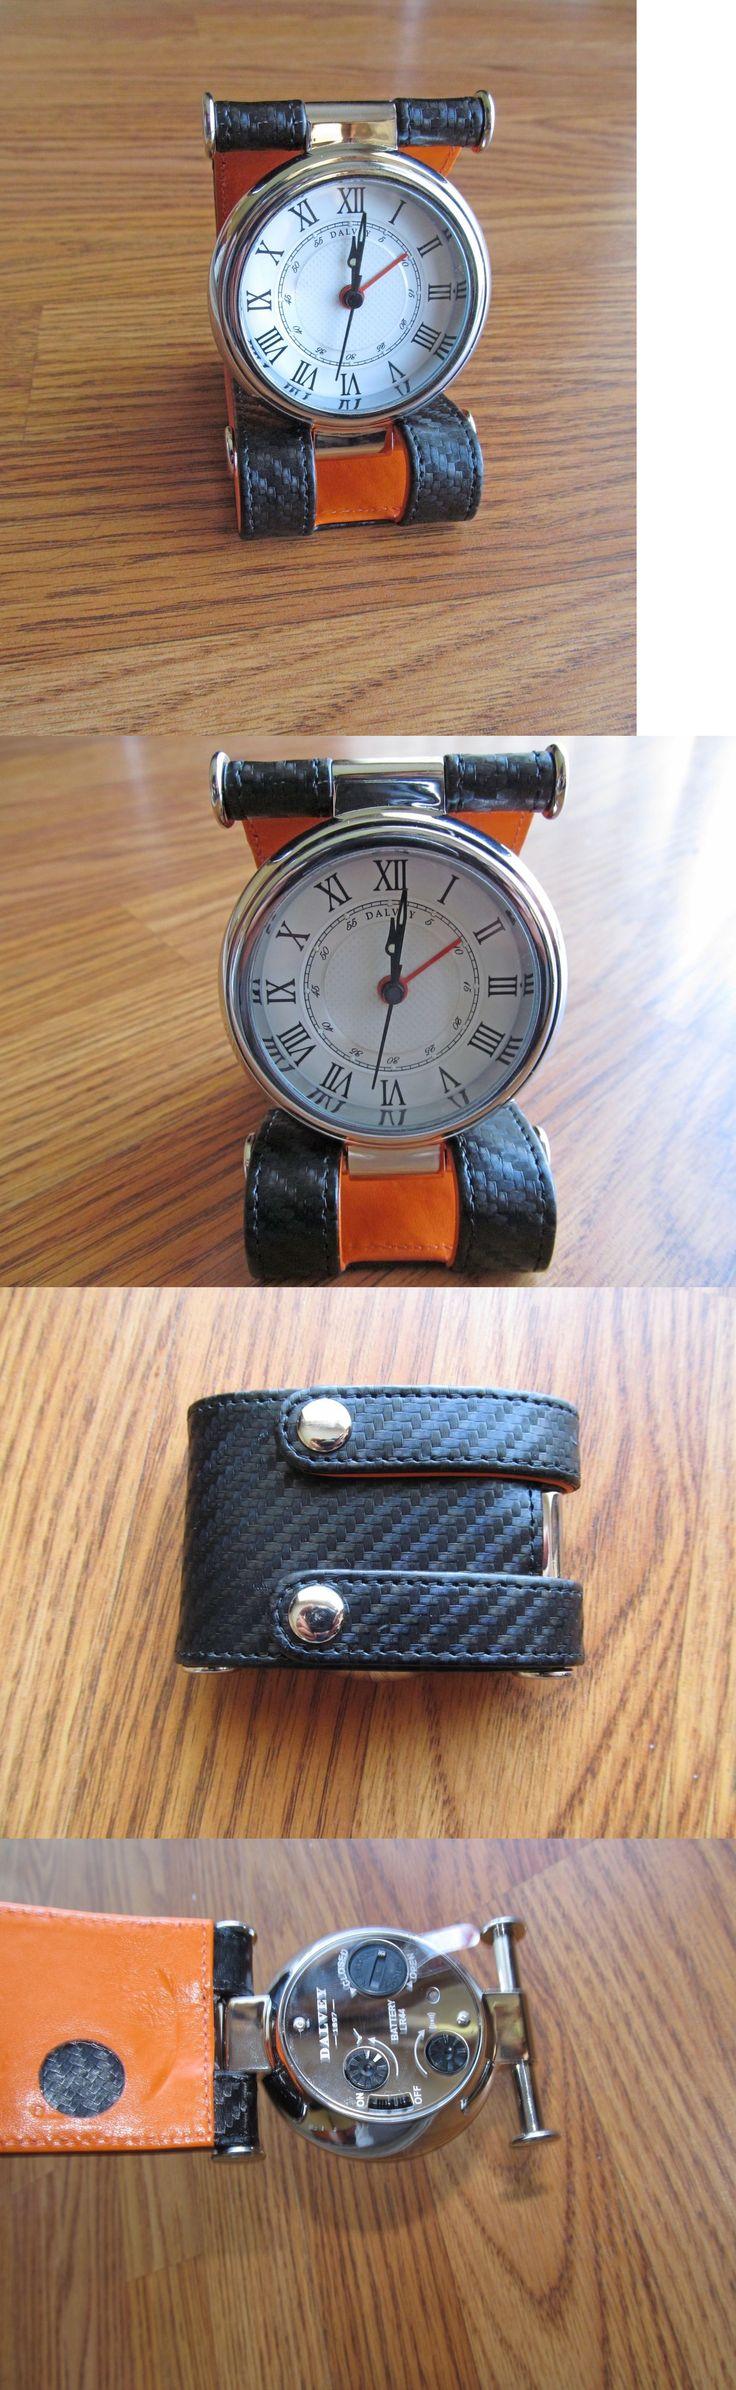 Desk Mantel and Shelf Clocks 175753: Dalvey Cavesson Clock Desk And Travel Clock , Orange New -> BUY IT NOW ONLY: $115 on eBay!